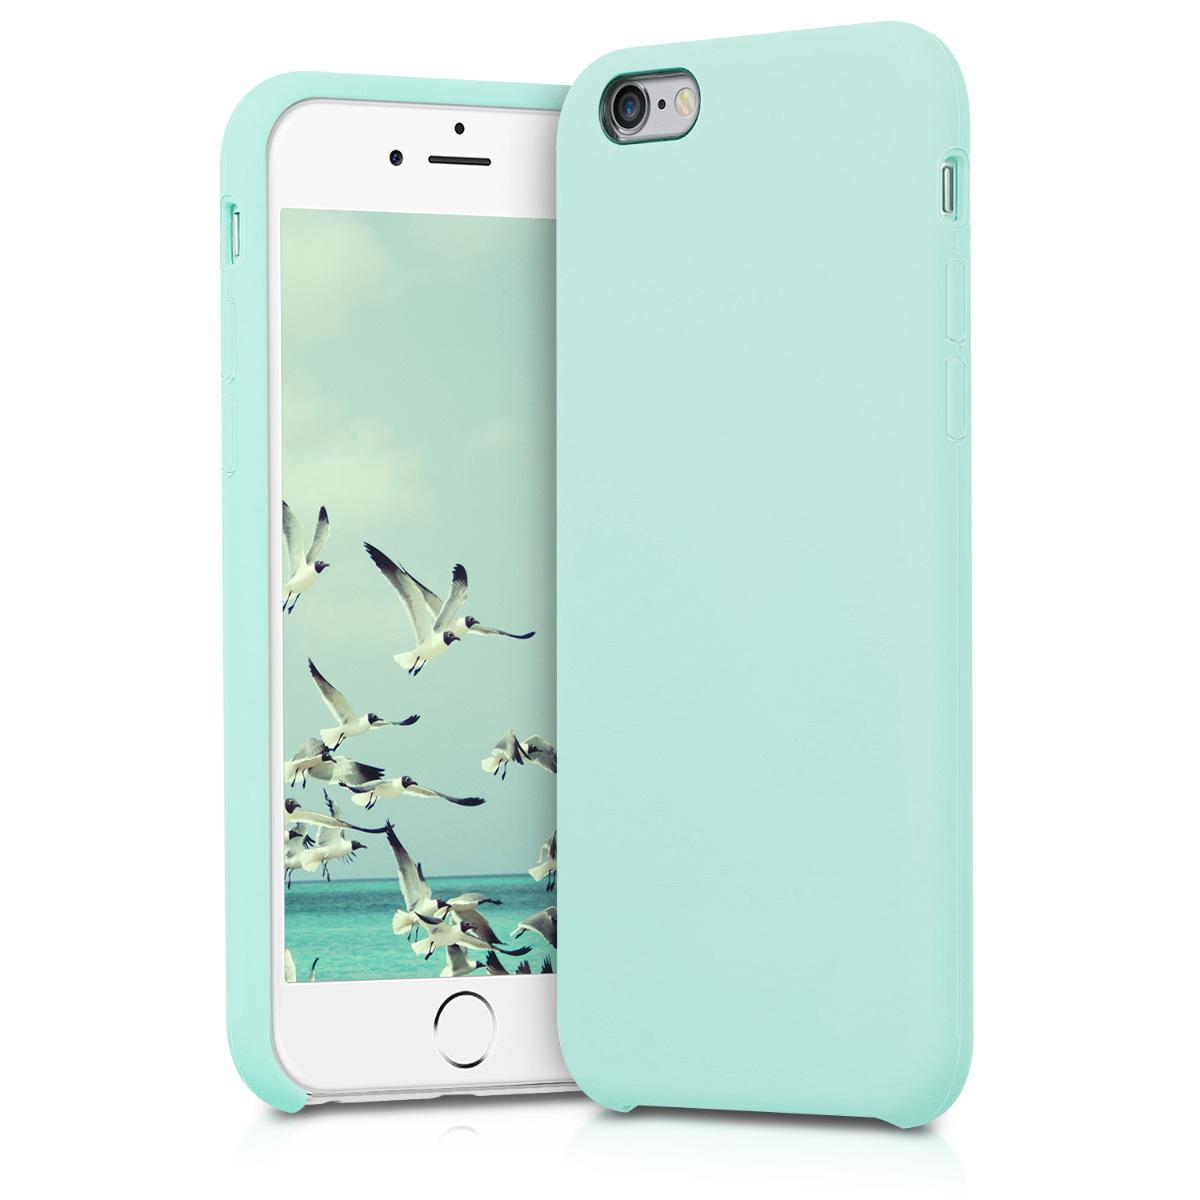 KW Θήκη Σιλικόνης Apple iPhone 6 / 6S - Soft Flexible Rubber - Mint Matte (40223.71)